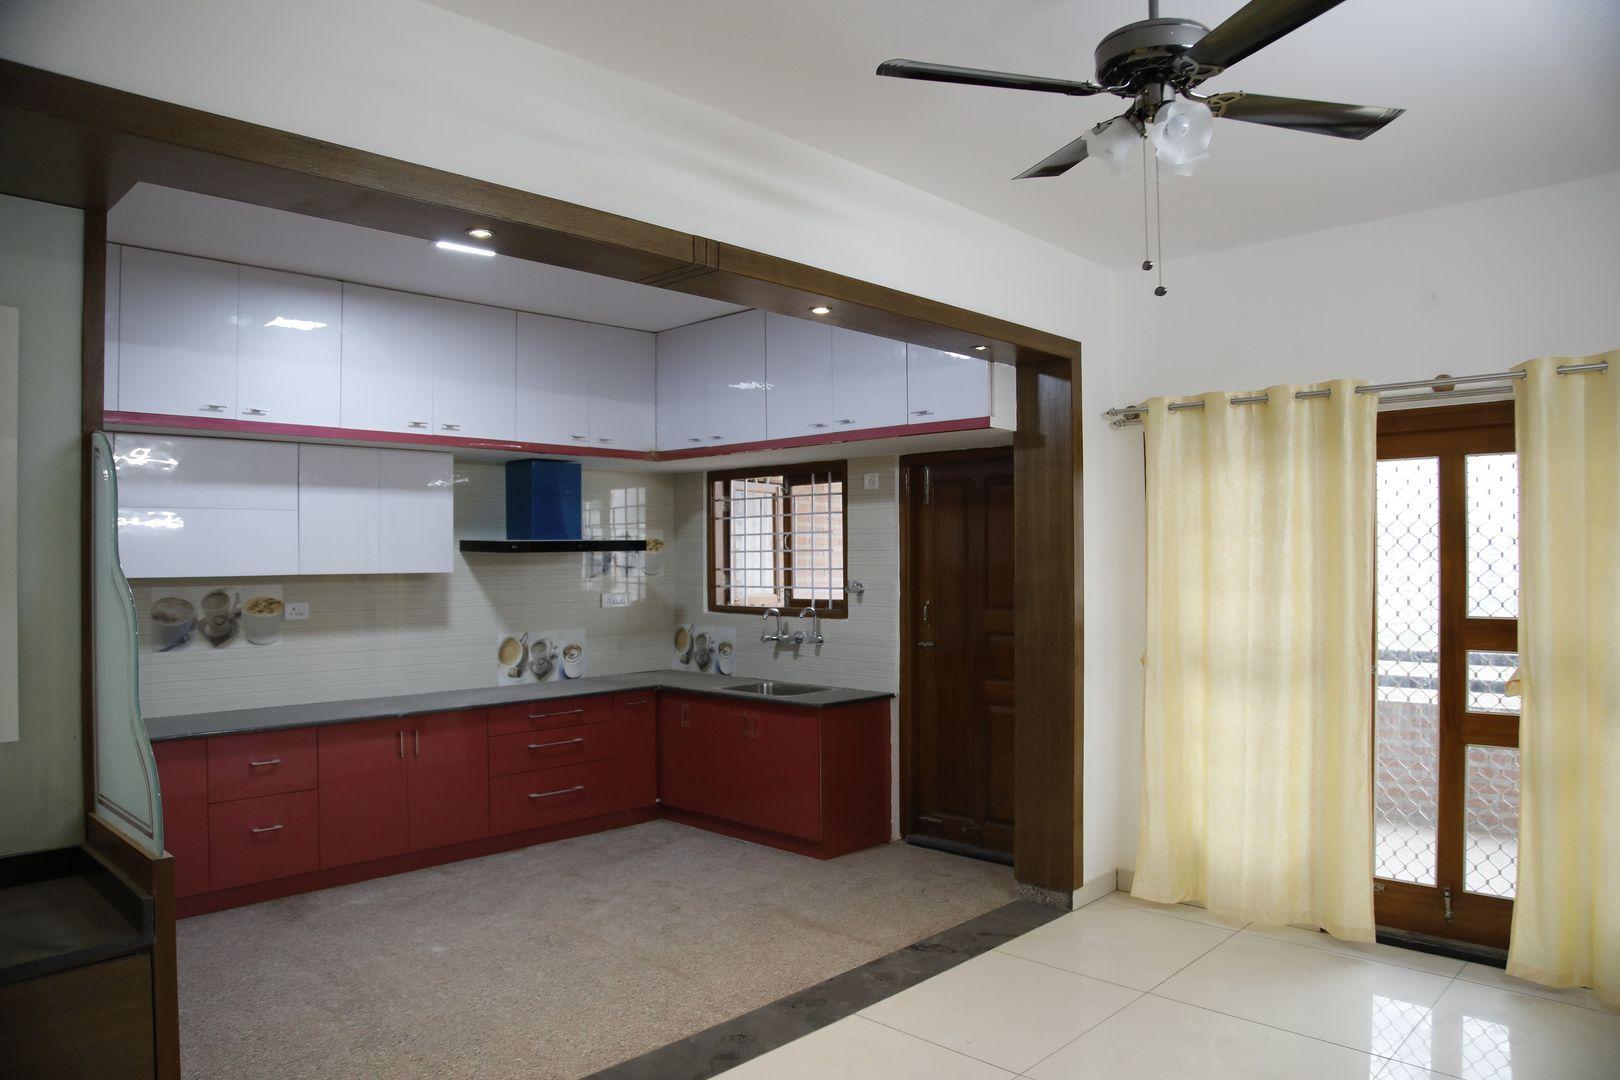 Indian Kitchen Design. Asian Style Kitchen Design Ideas Pictures Homify Indian kitchen designs